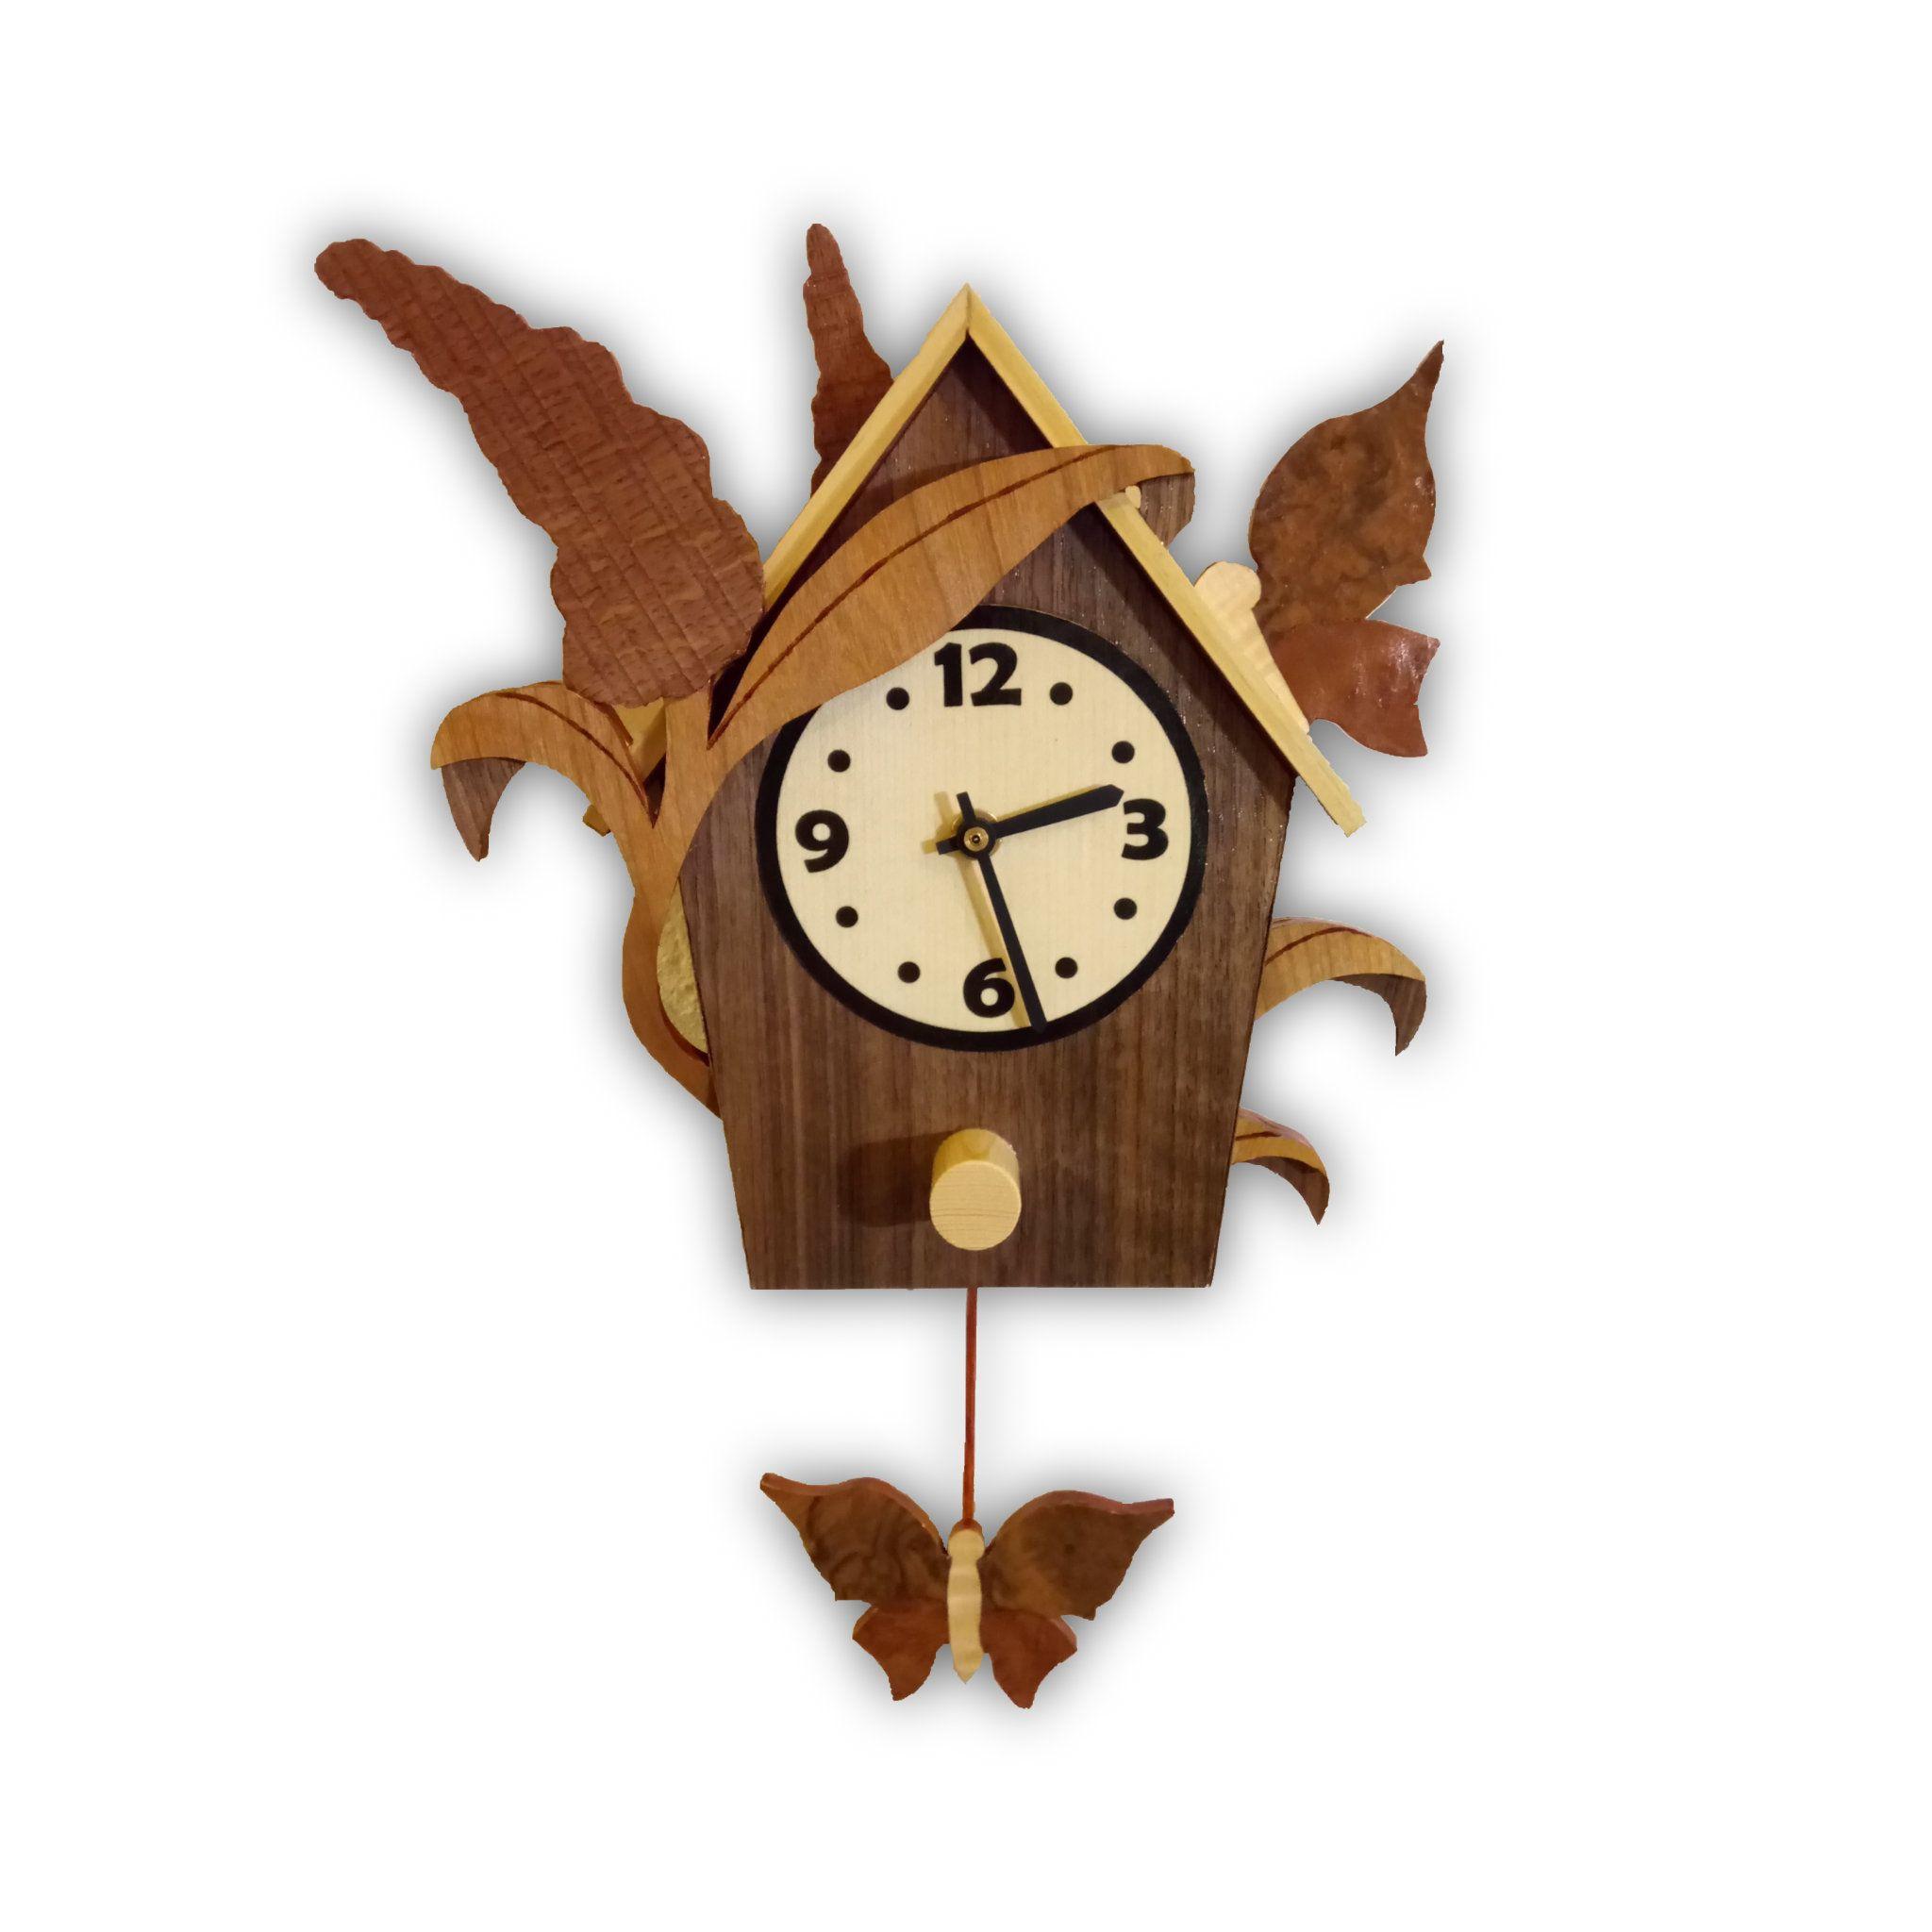 Butterfly Buddleia Pendulum Wall Clock Pendulum Wall Clock Wall Clock Design Wall Clock